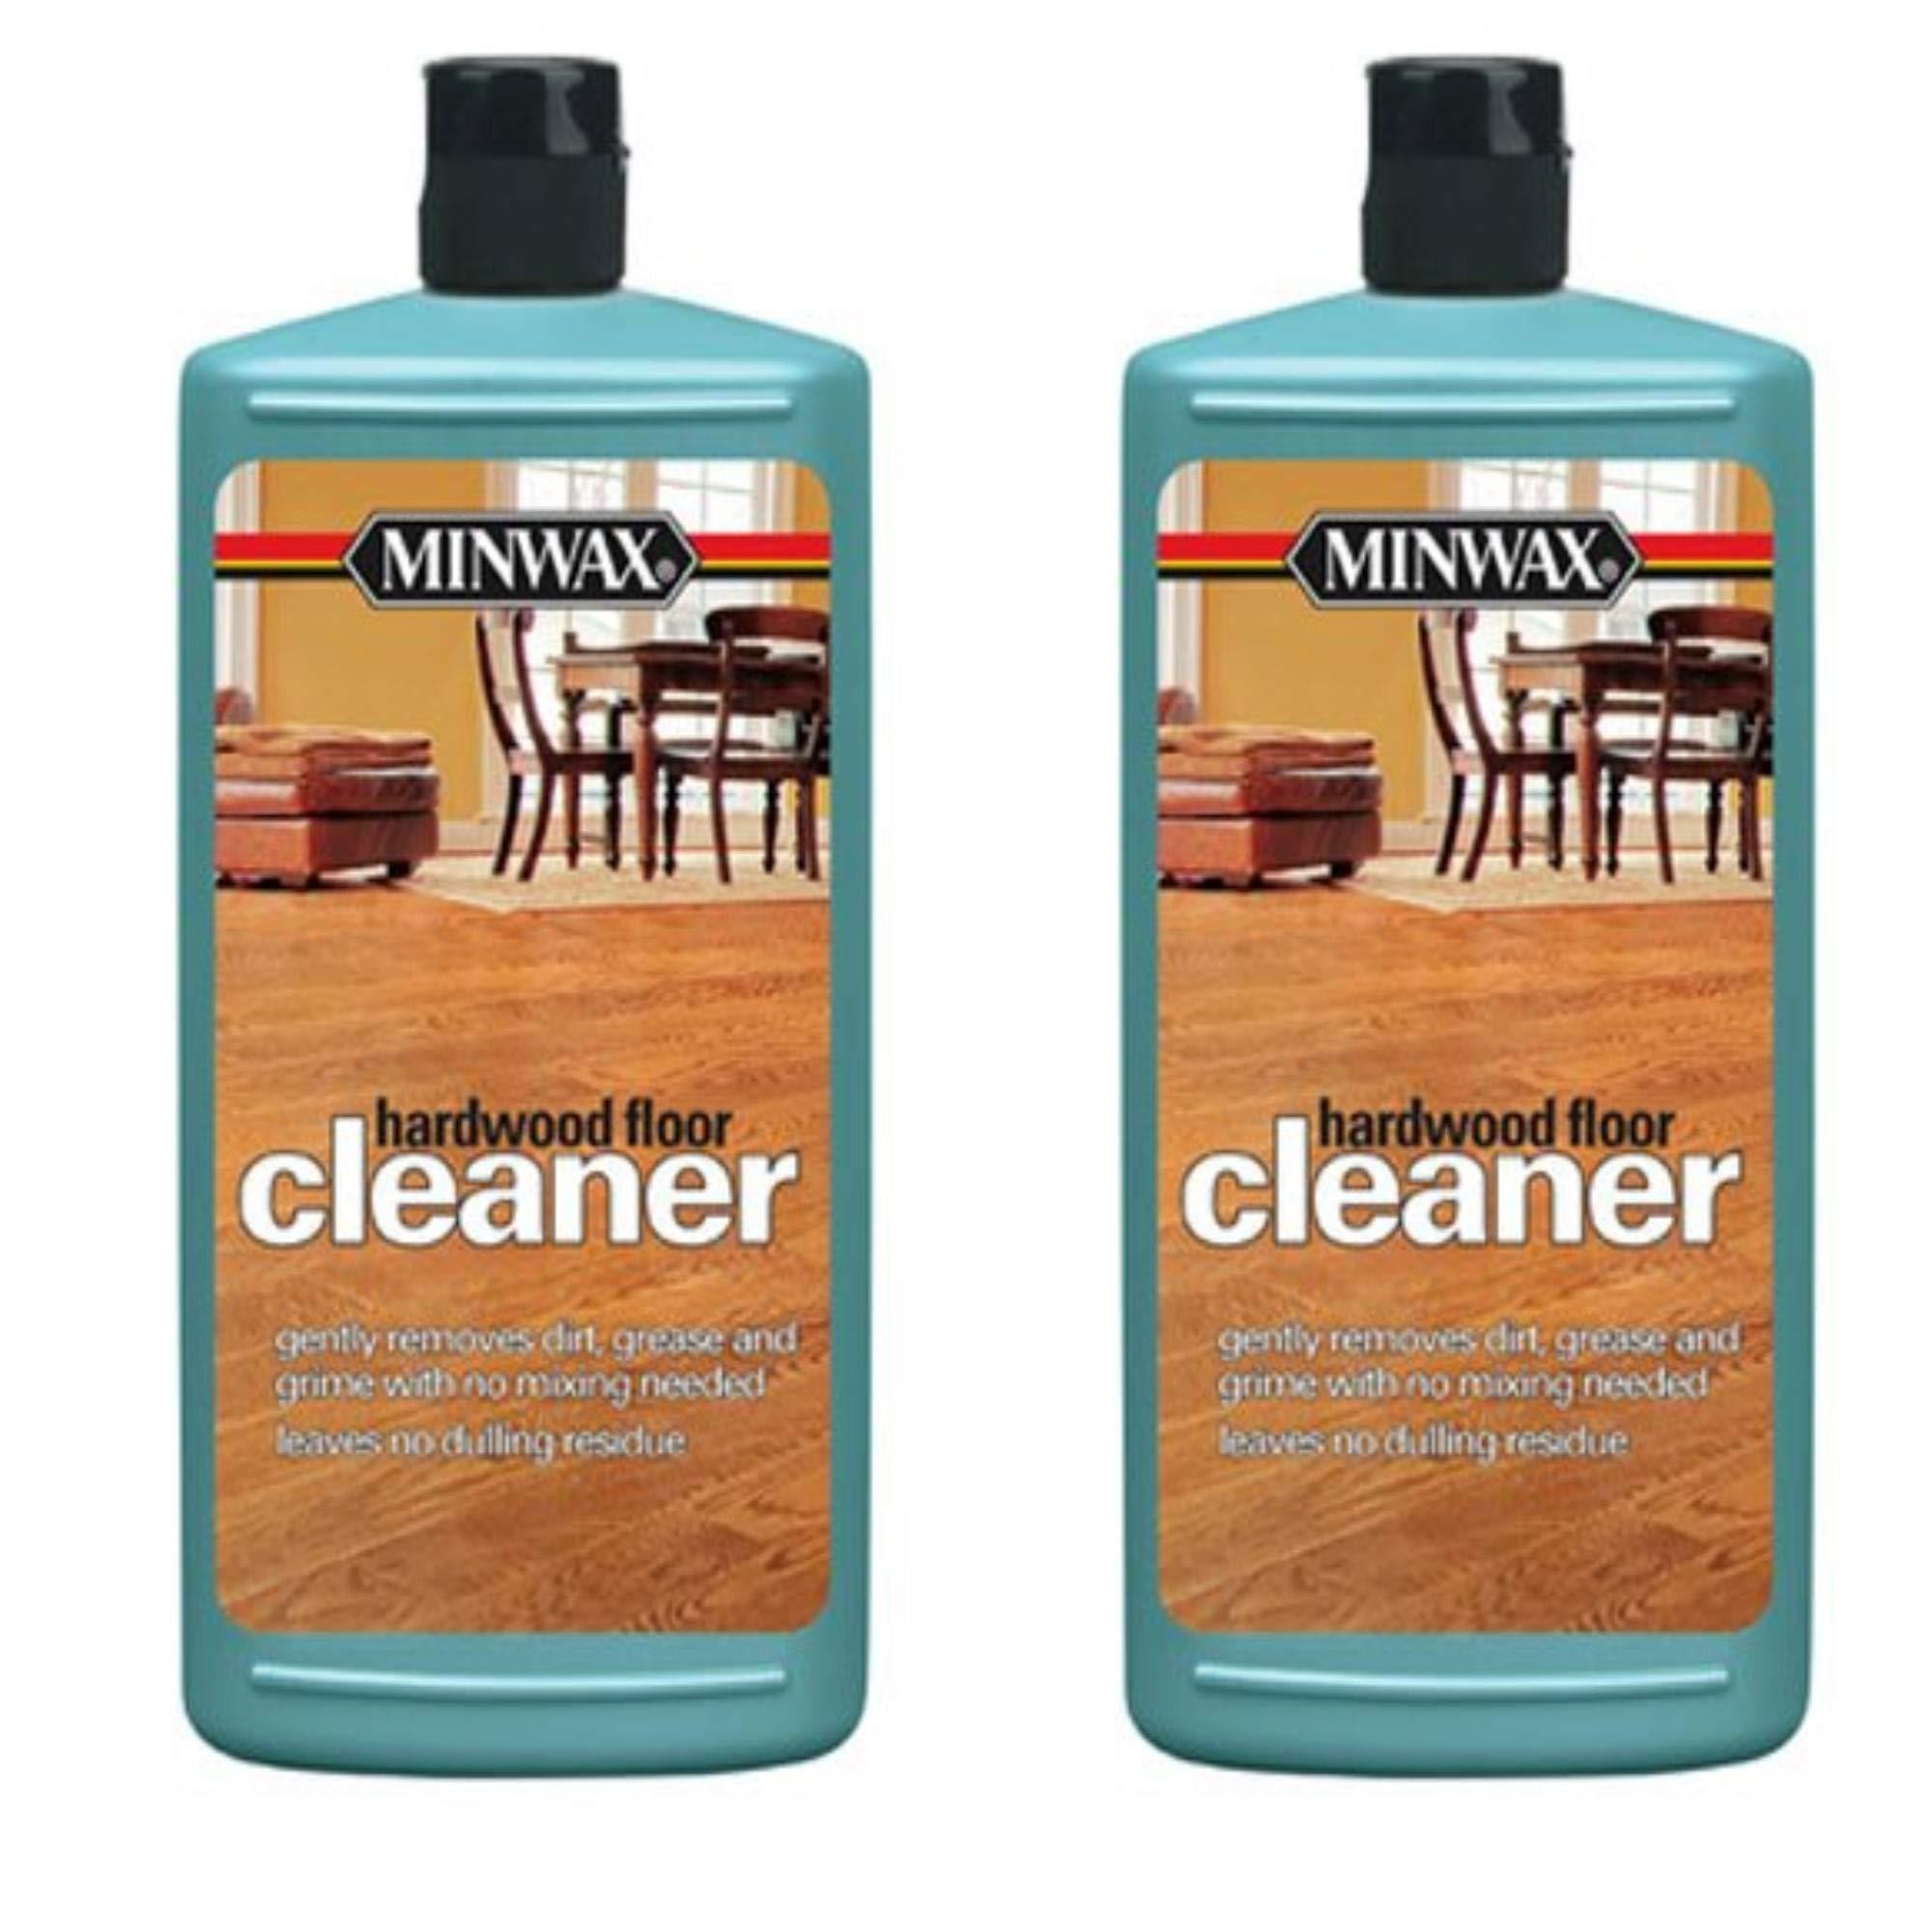 Minwax 621270004 Hardwood Floor Cleaner, 32 ounce - 2 PACK by Minwax